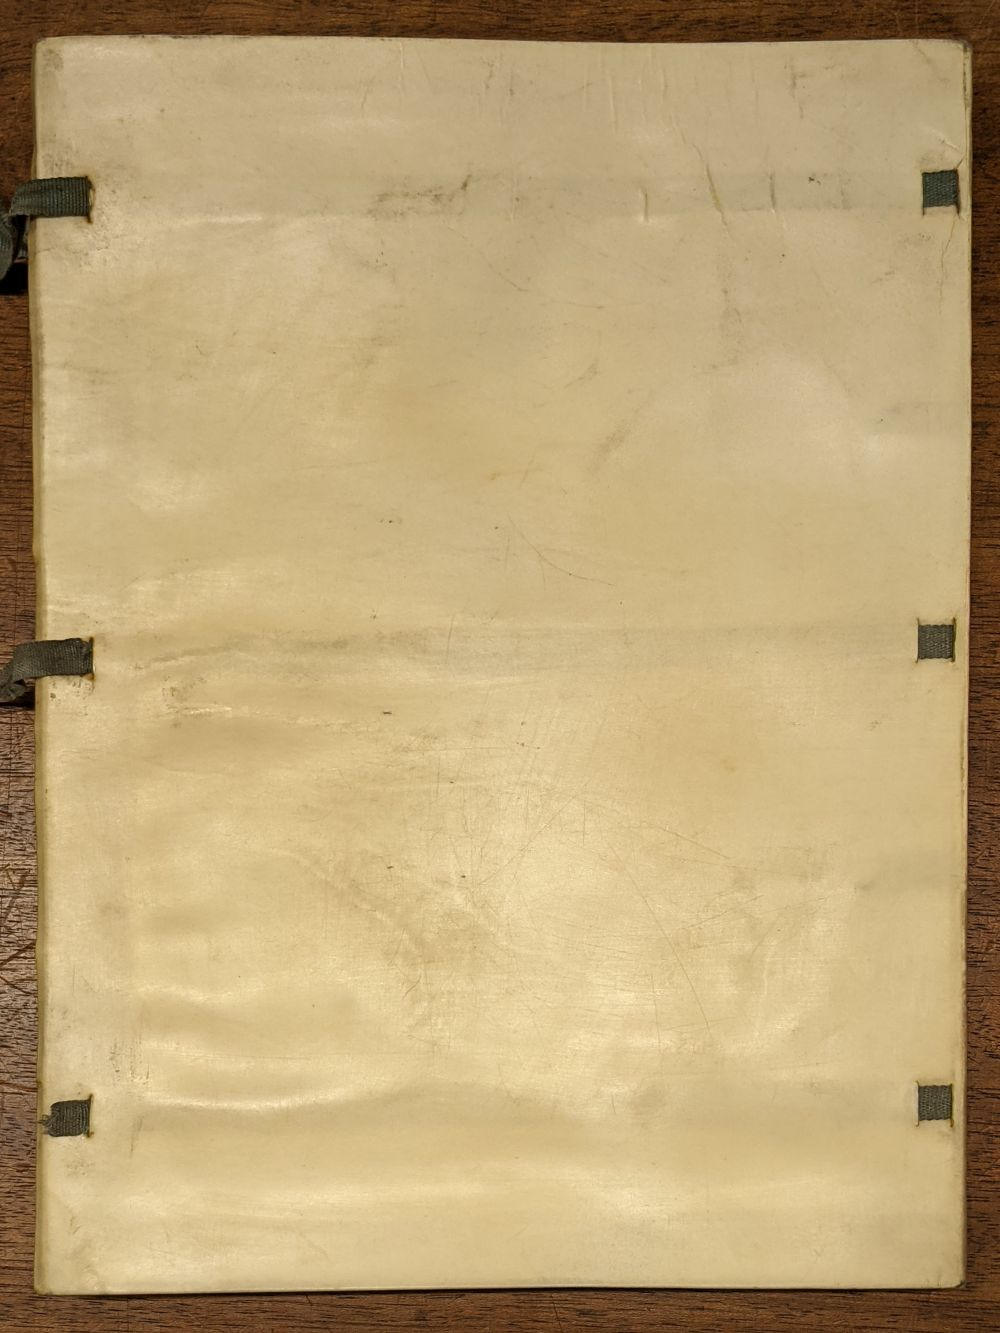 Kelmscott Press. The Story of the Glittering Plain, 1894 - Image 4 of 10